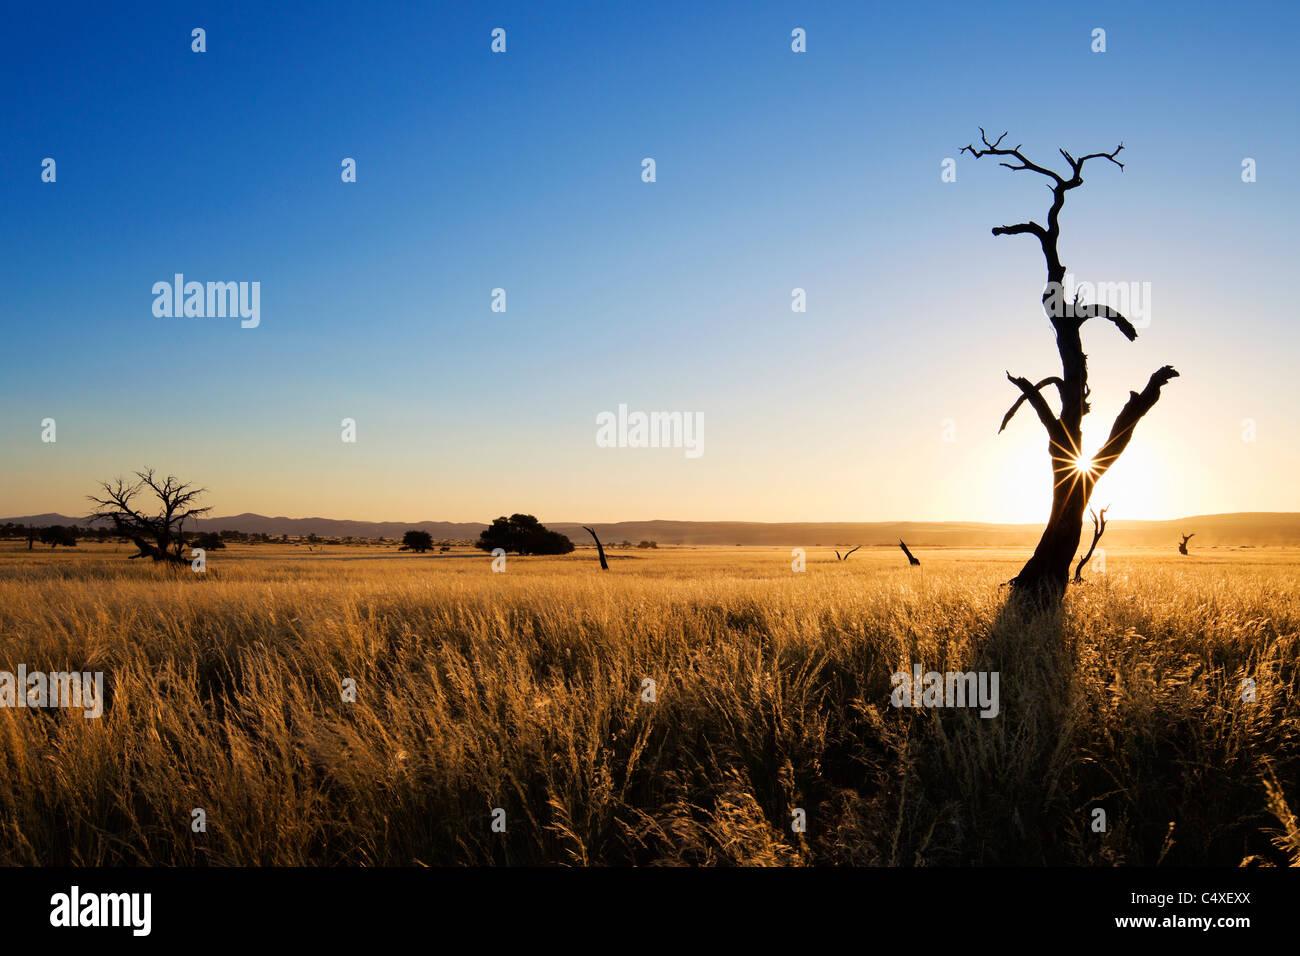 Scenery showing the unique ecology of the south-west Namib desert or pro -Namib. NamibRand Nature Reserve, Namibia - Stock Image